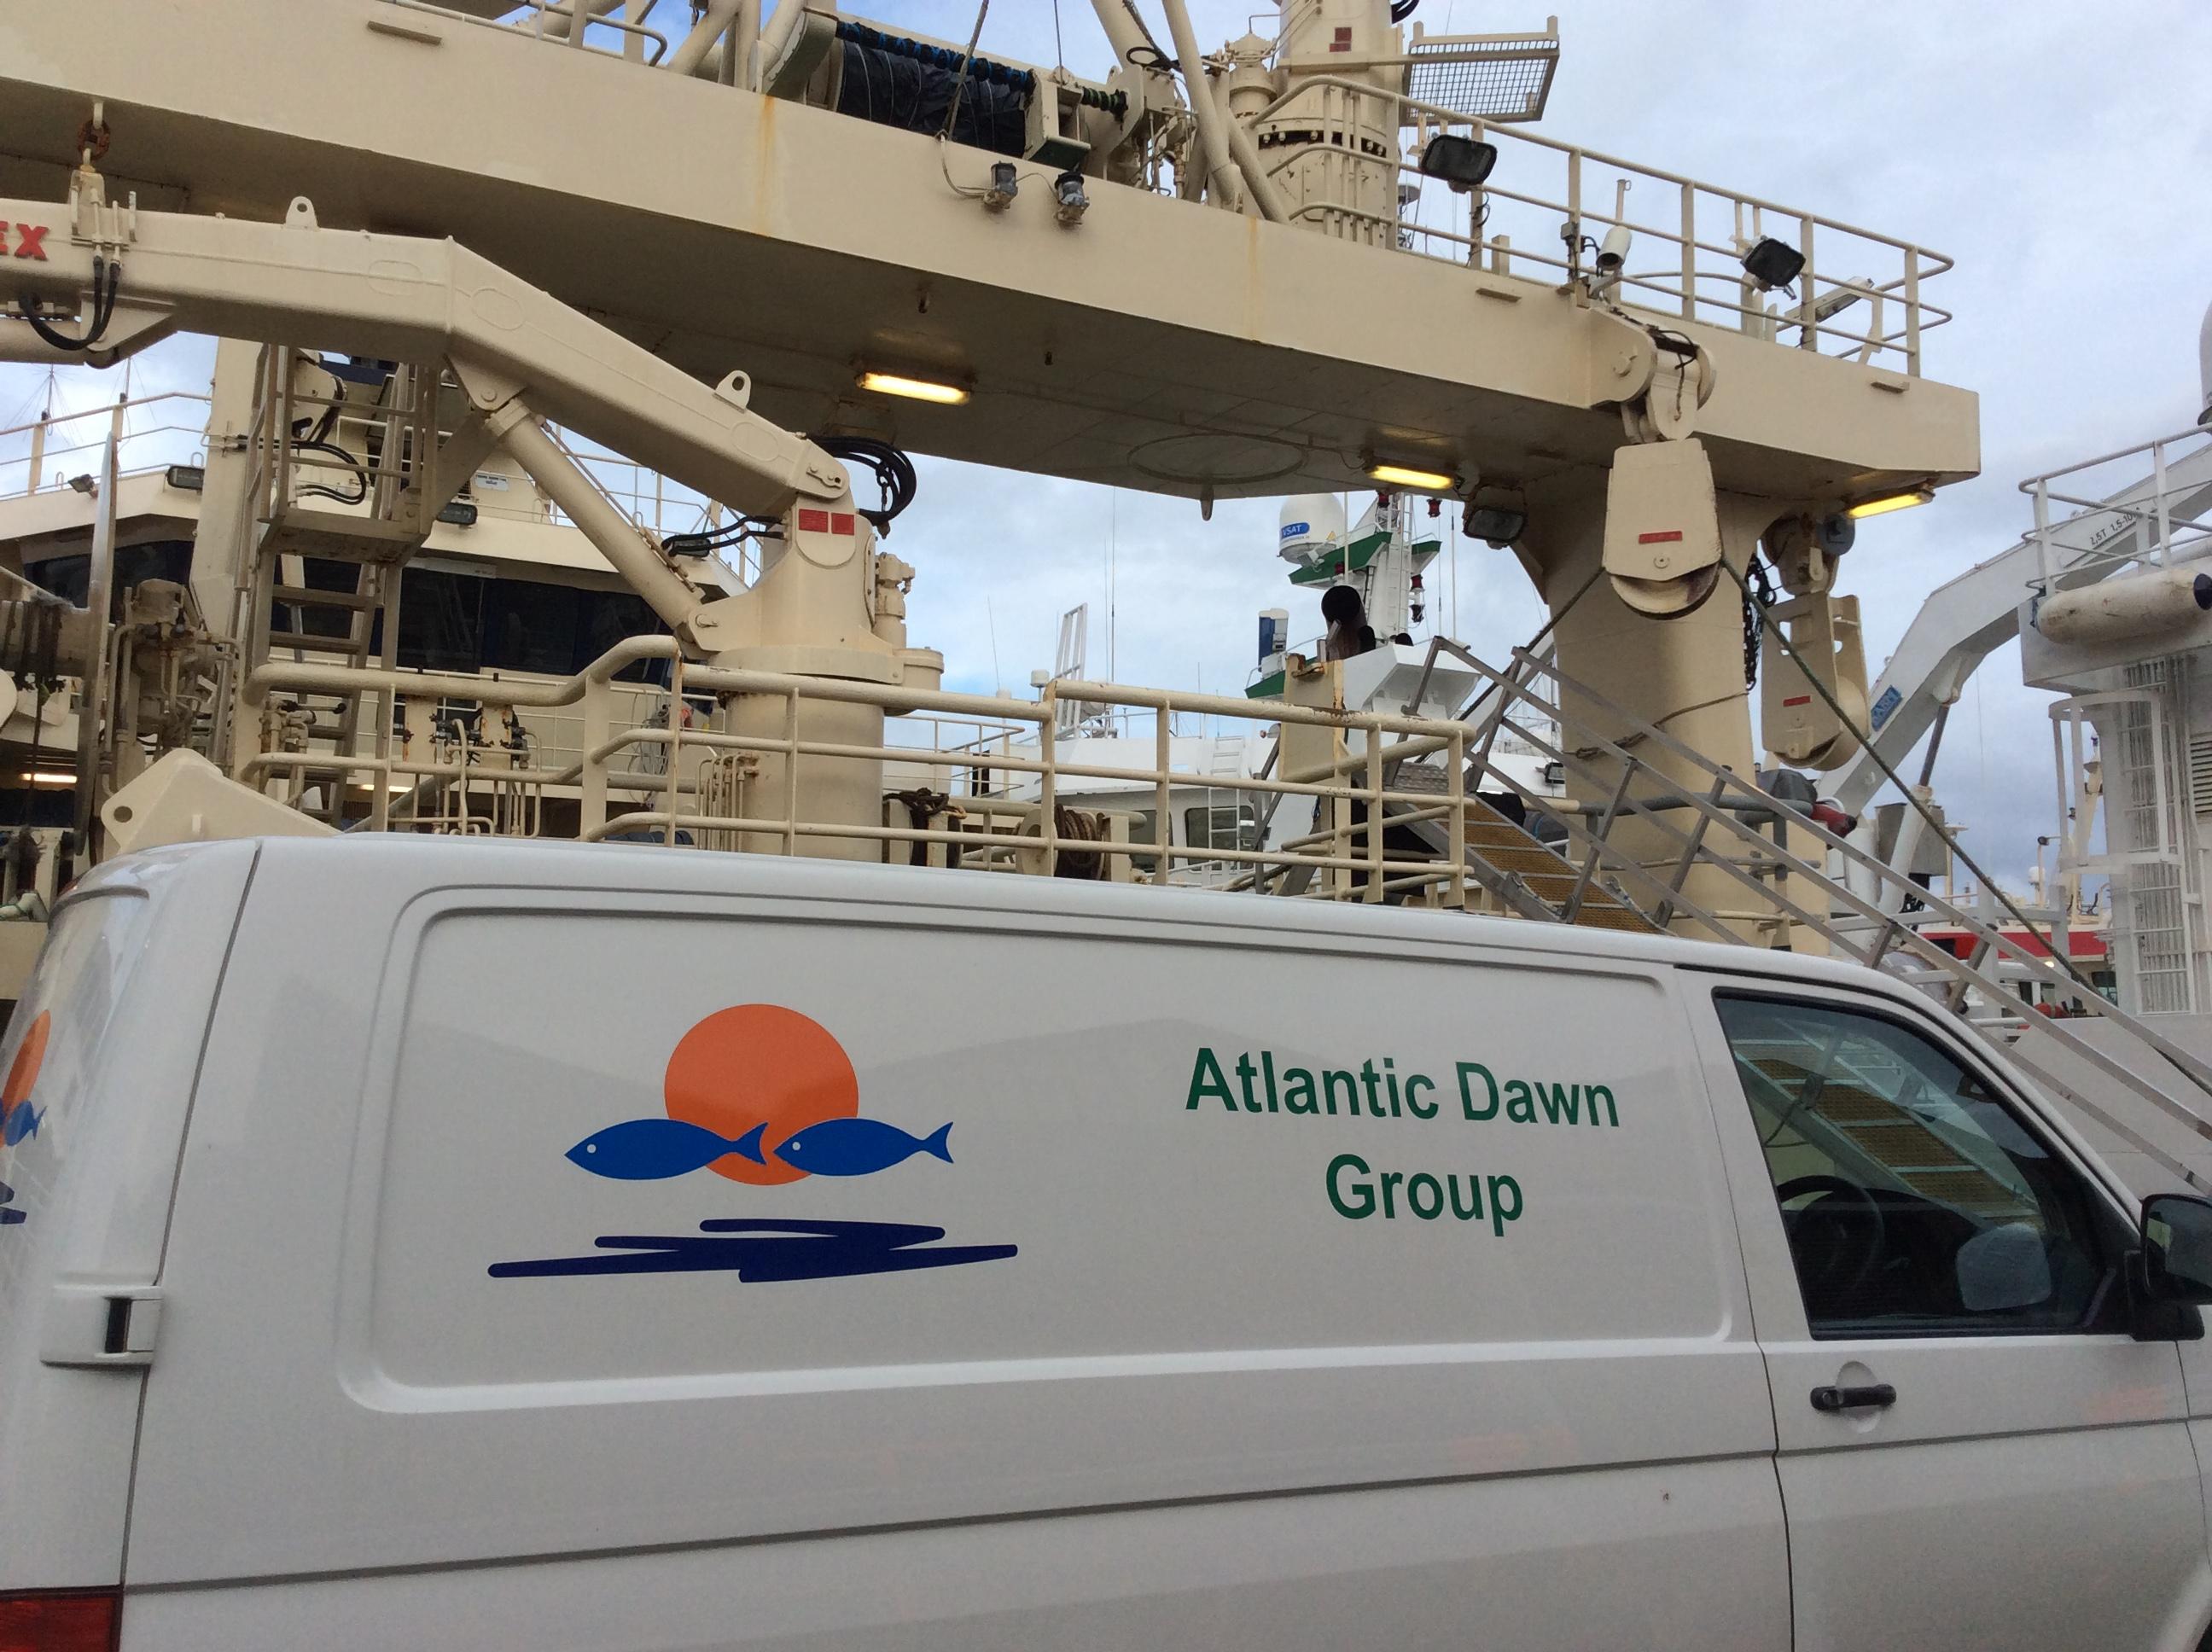 Vehicle of Atlantic Dawn Group